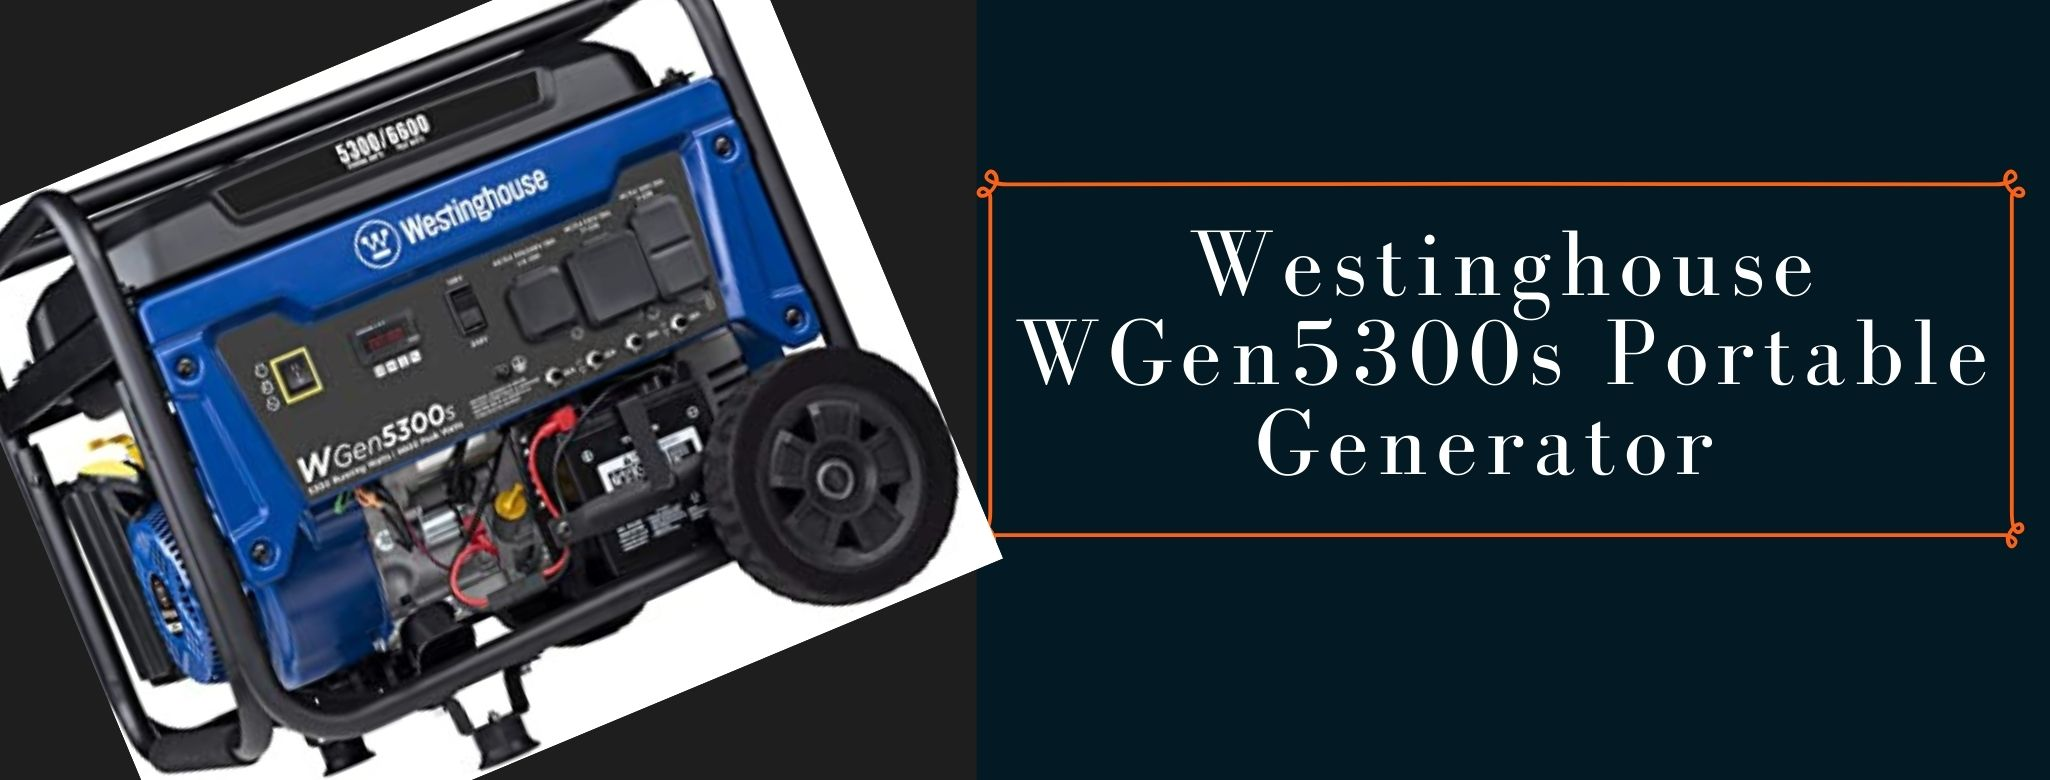 westinghouse WGen5300s portable power station